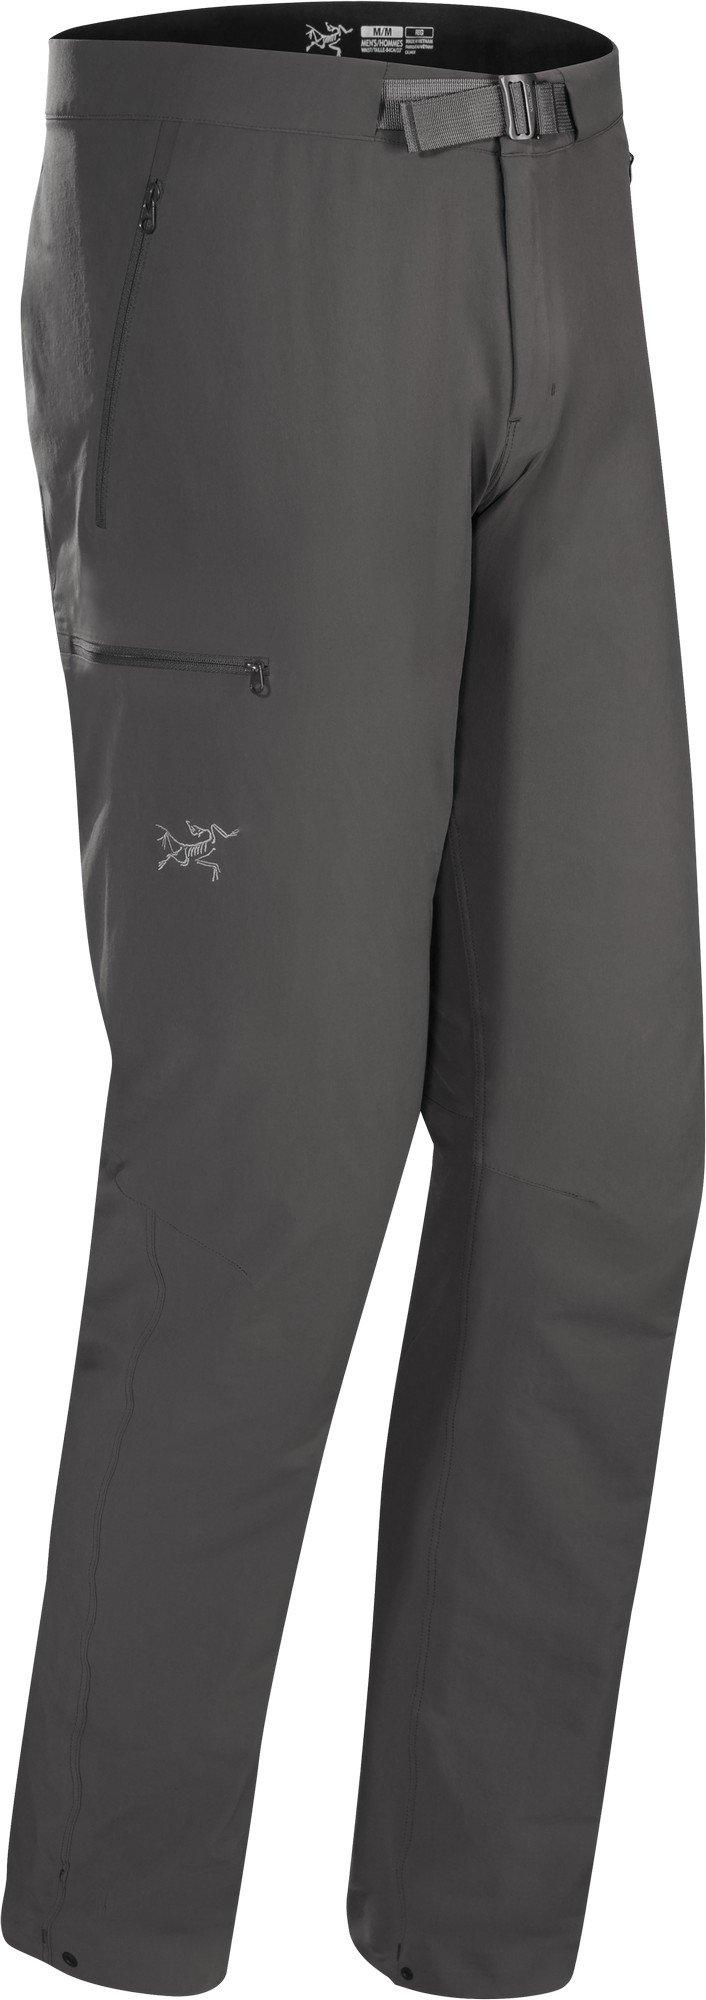 ARC'TERYX Gamma LT Pant Men's (Pilot, Small-Short)